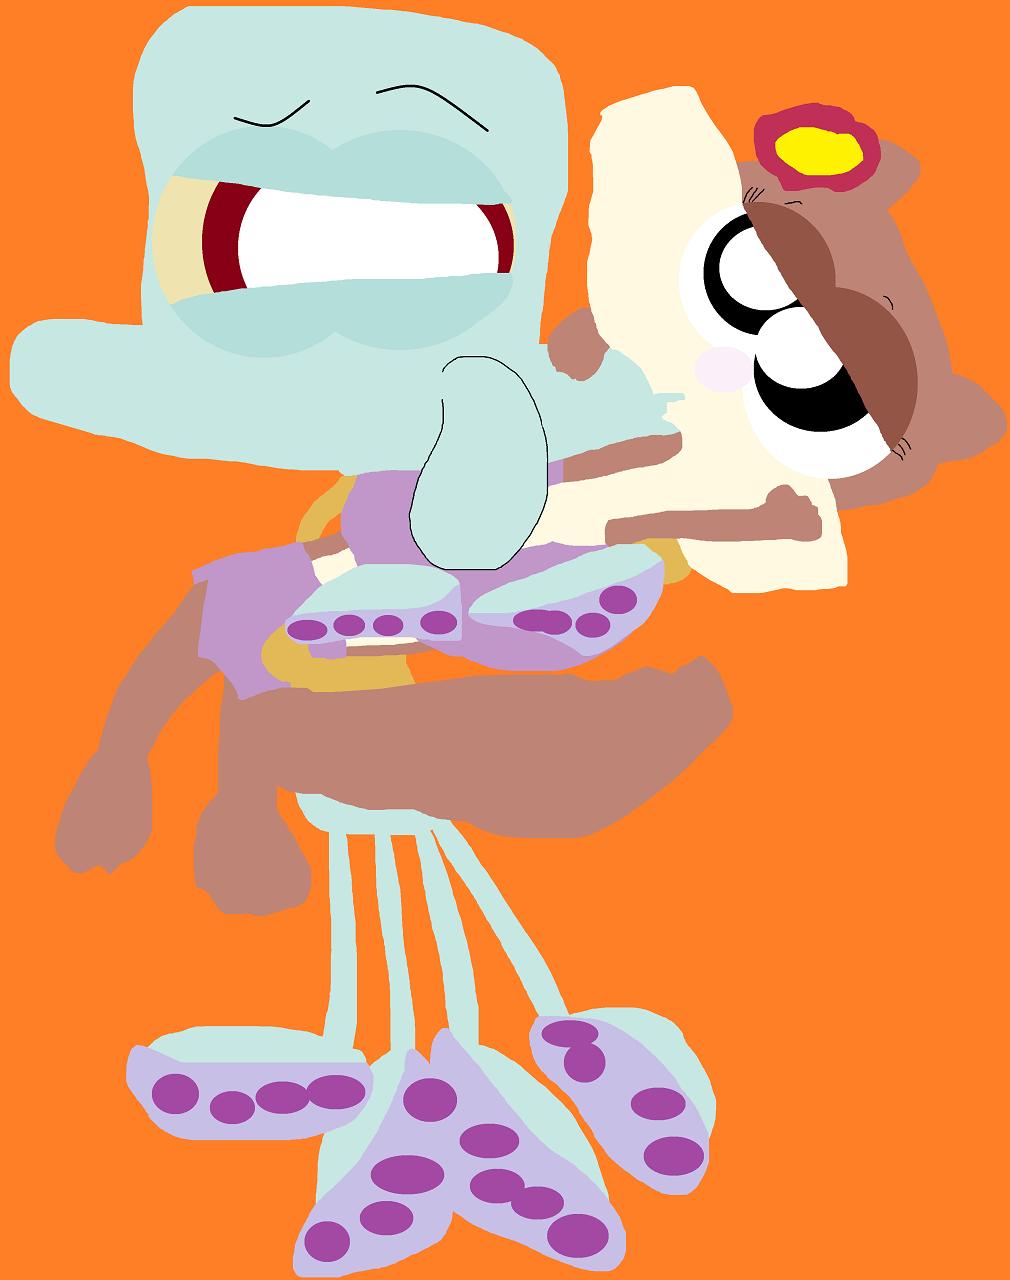 Random Squidward Holding And Kissing Sandy by Falconlobo